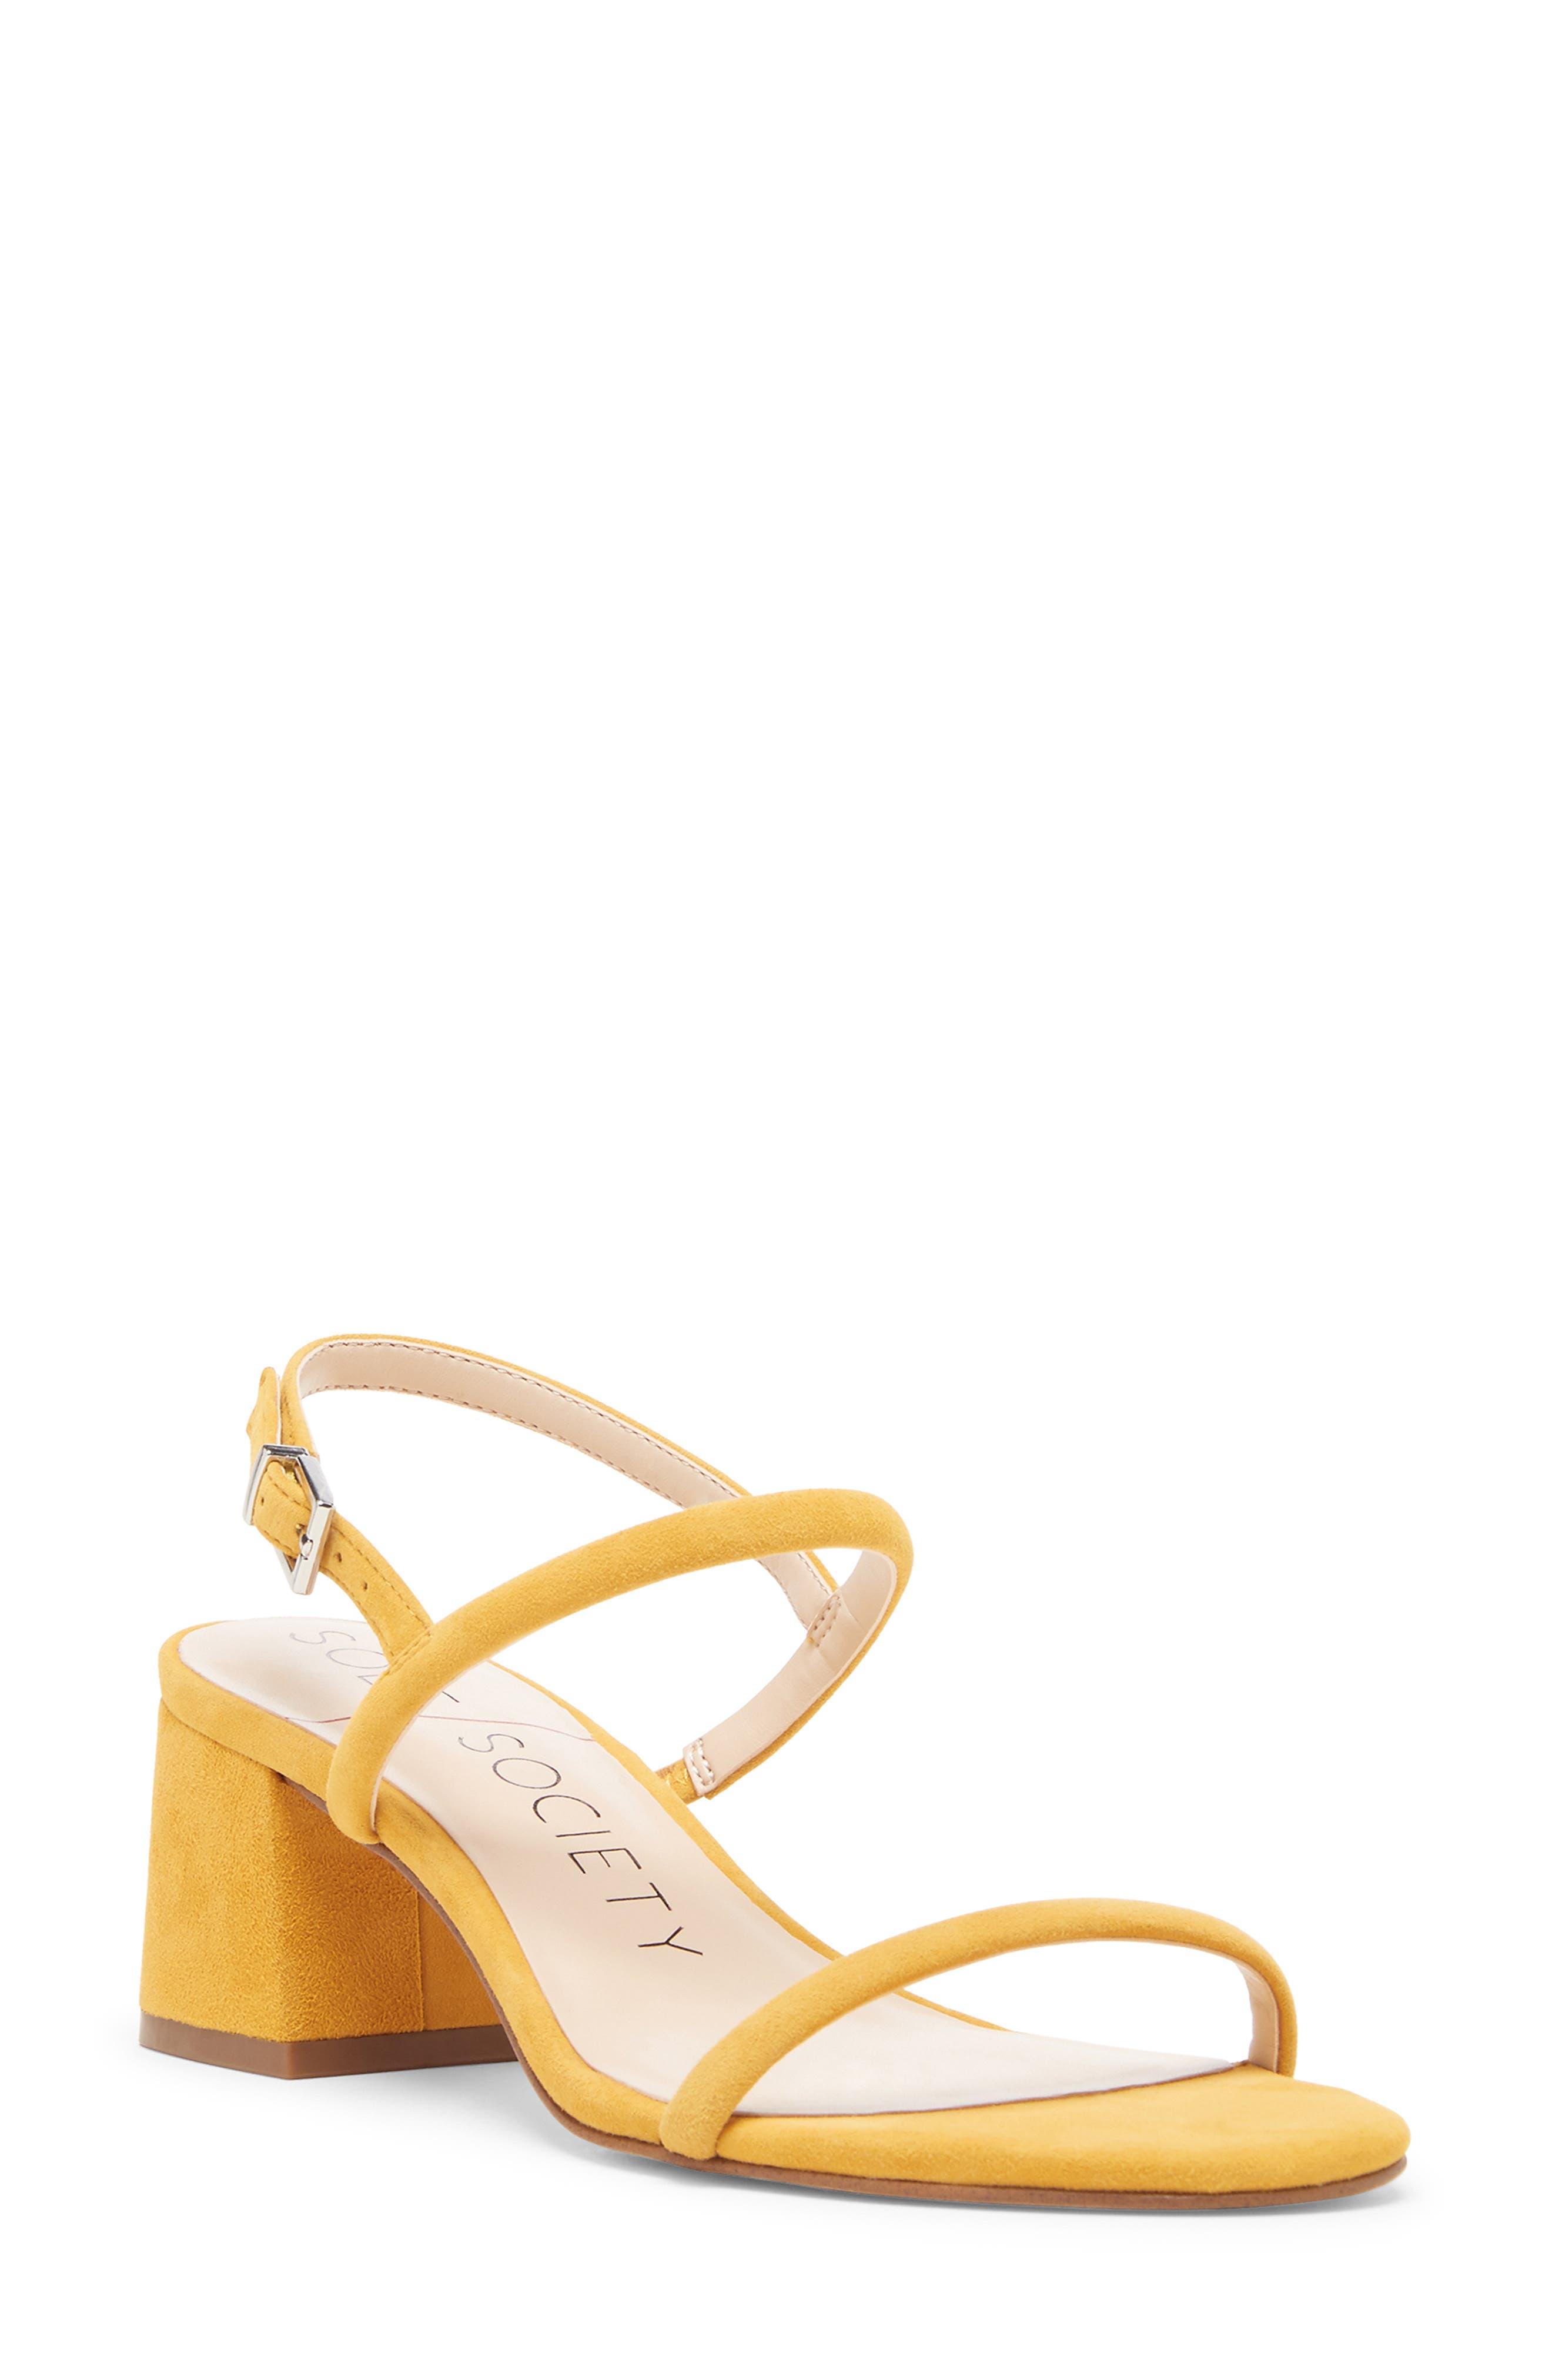 Sole Society Saunye Strappy Sandal Women Coupon